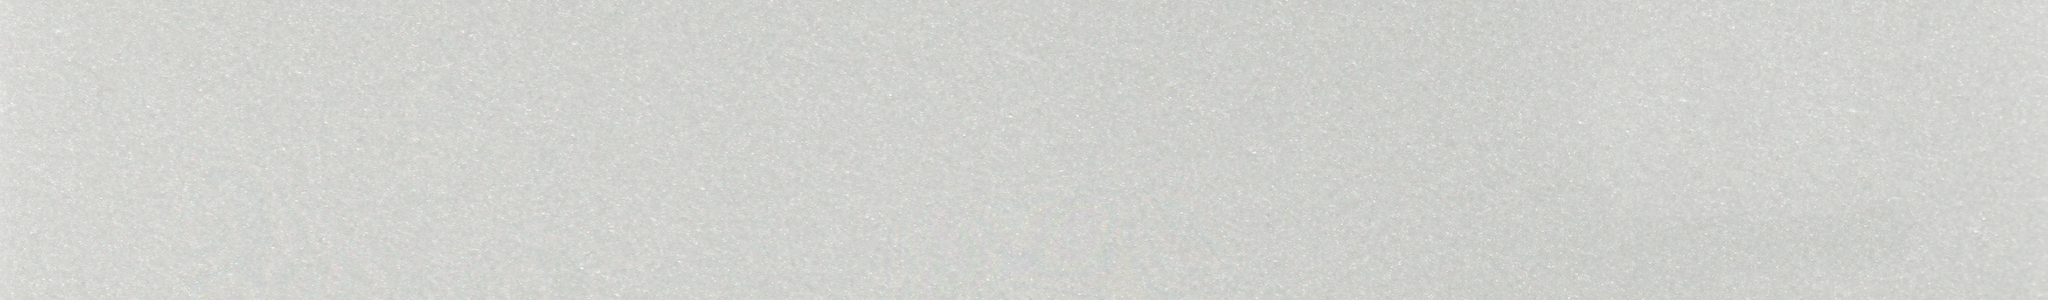 HSE 298663 ABS hrana s akryl fólií metal stříbro hladká lesk 90° Hot-Air